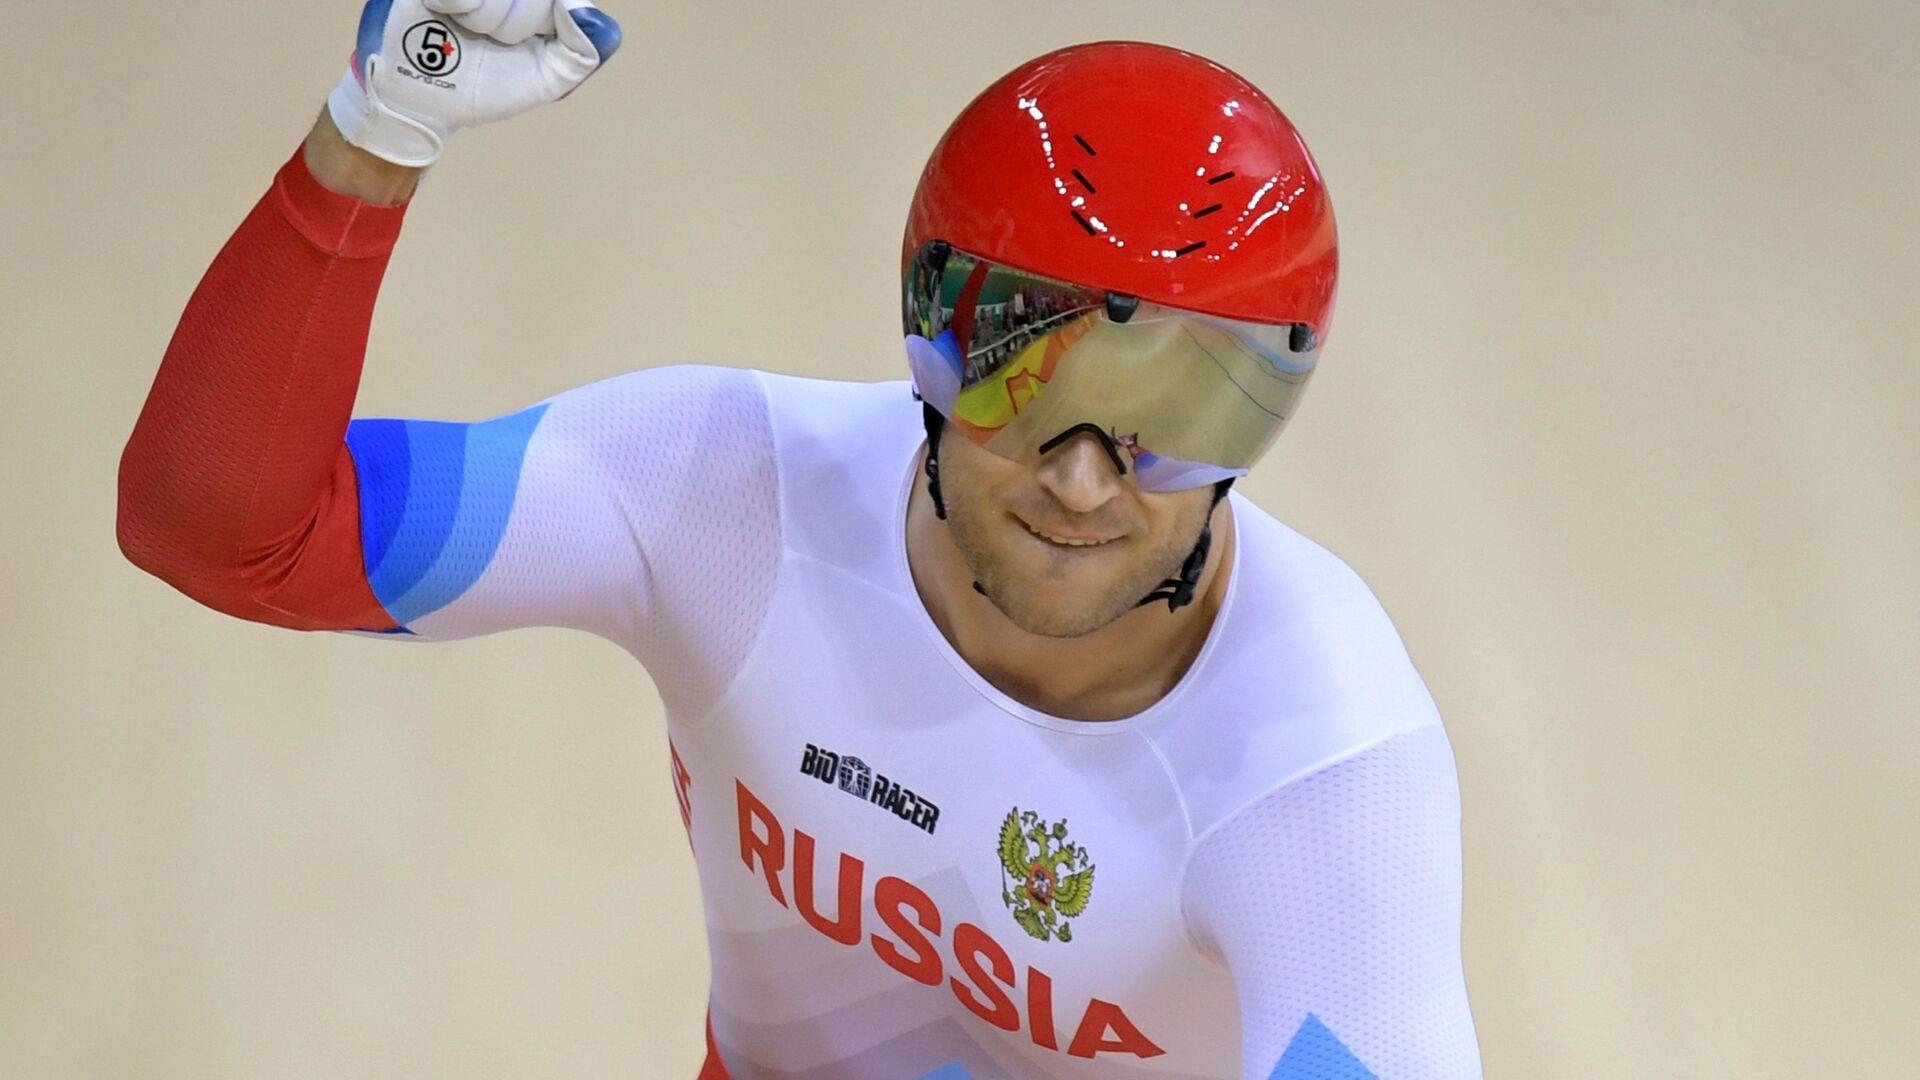 Денис Дмитриев в заезде за третье место индивидуального спринта на XXXI летних Олимпийских играх - РИА Новости, 1920, 23.07.2020